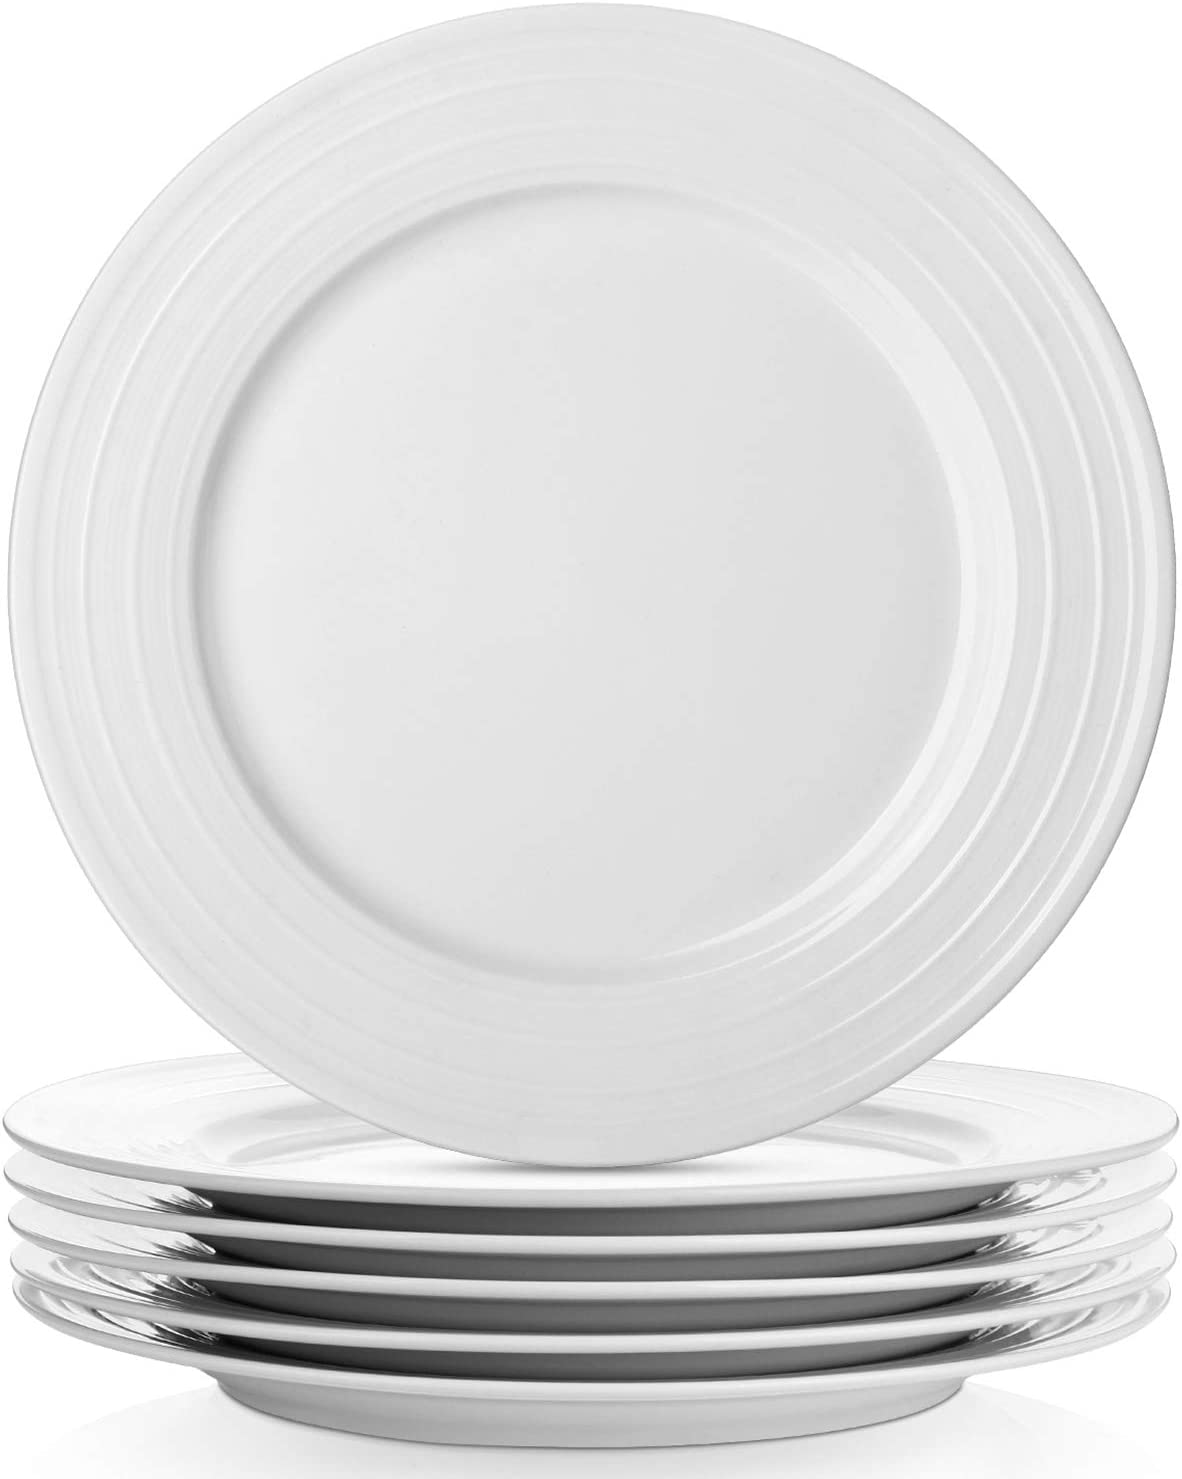 LIFVER 7-Piece White Dinner Plates Set, 7 Inches Porcelain Plates Set of  7,White